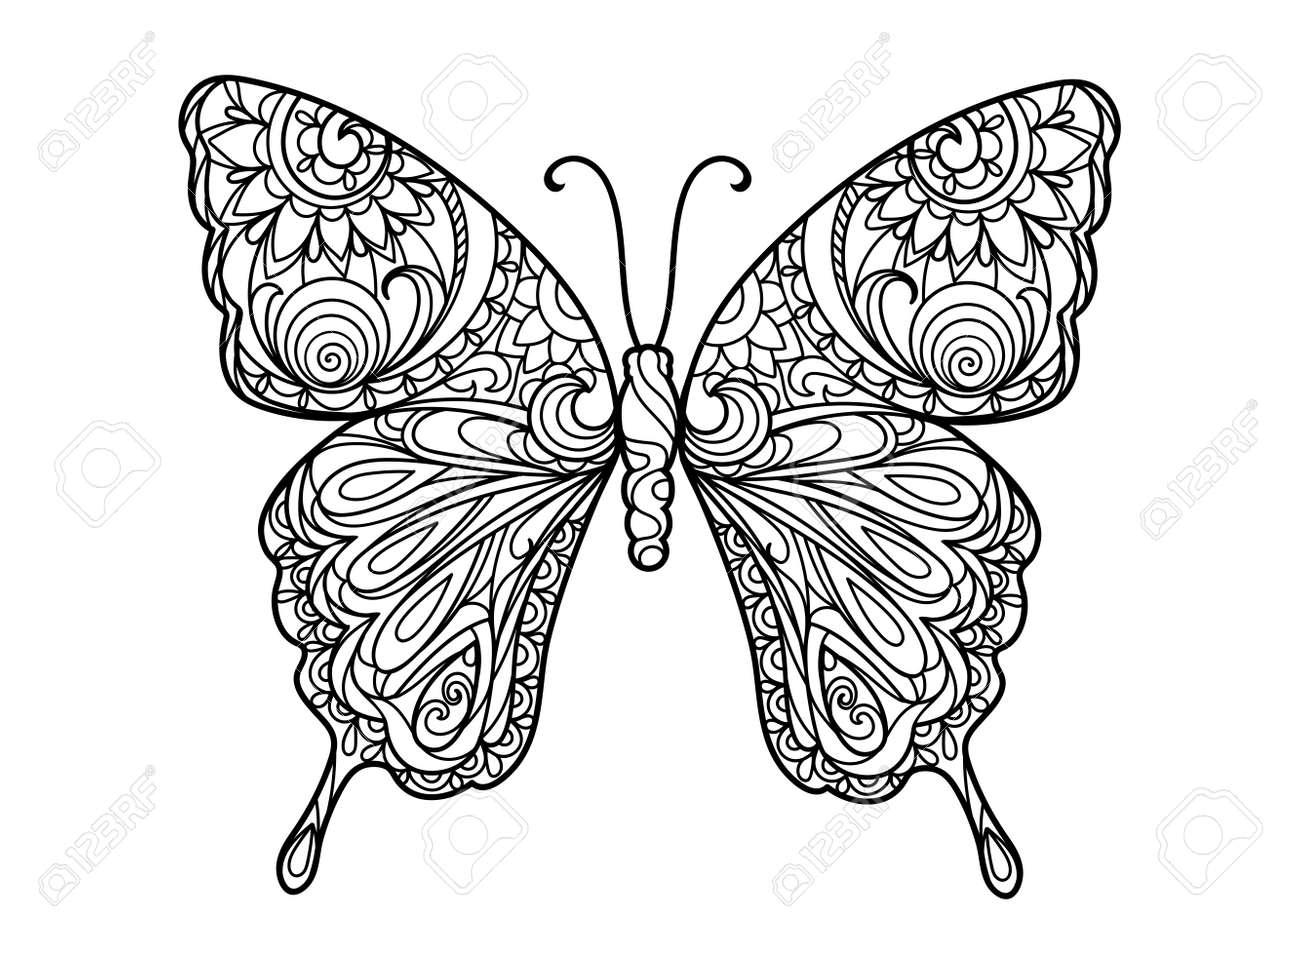 Atemberaubend Coloriage Mandala Papillon Zeitgenössisch ...